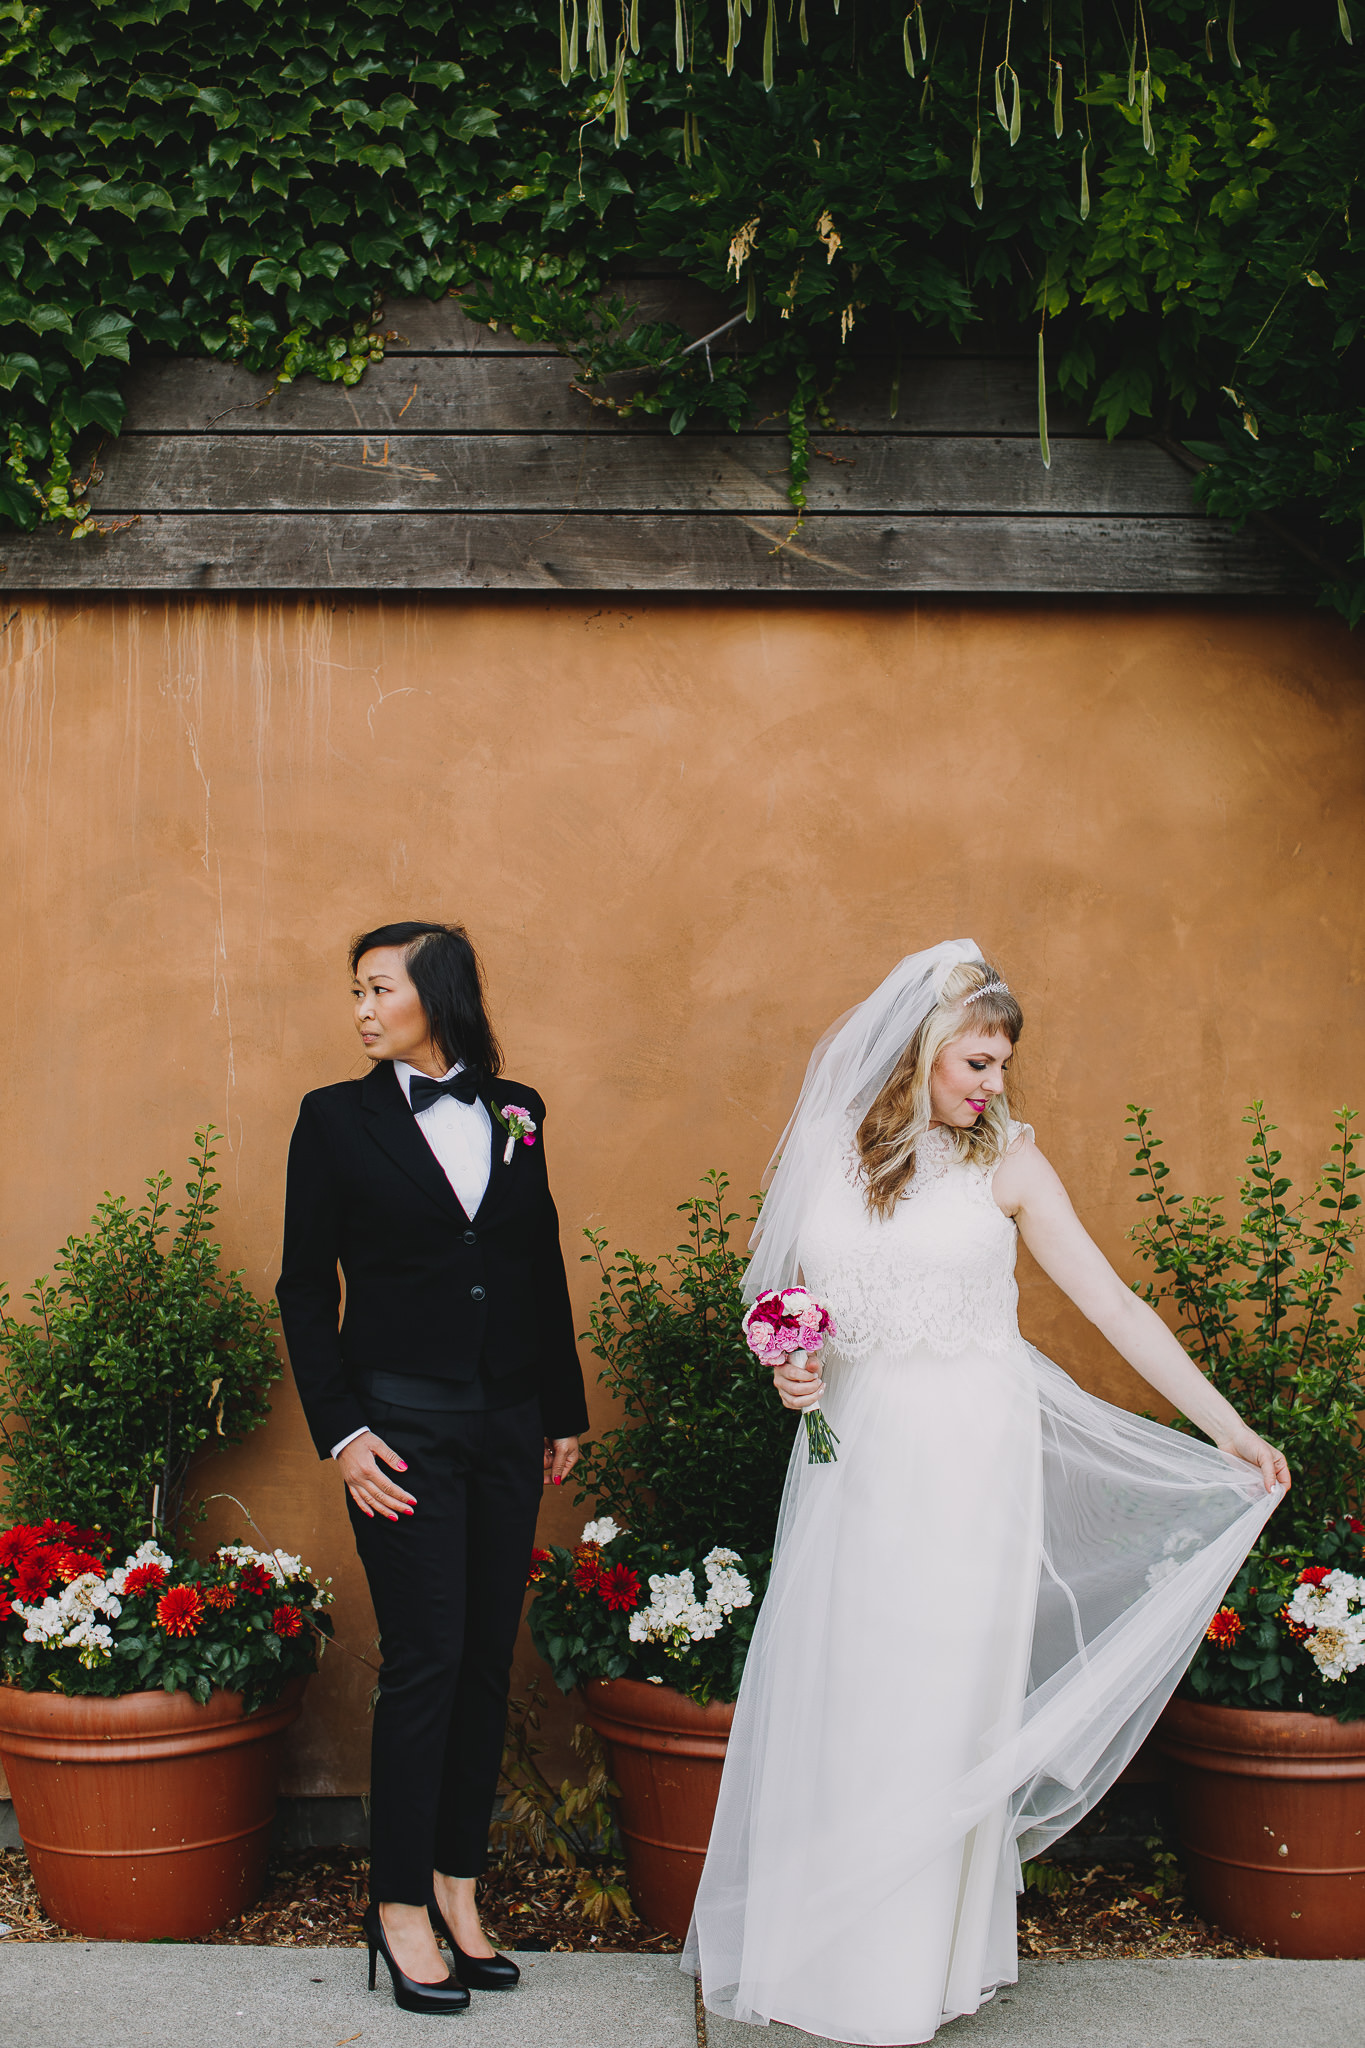 Archer Inspired Photography - LGBTQ Wedding Mill Valley California - Norcal SoCal Photographer-346.jpg